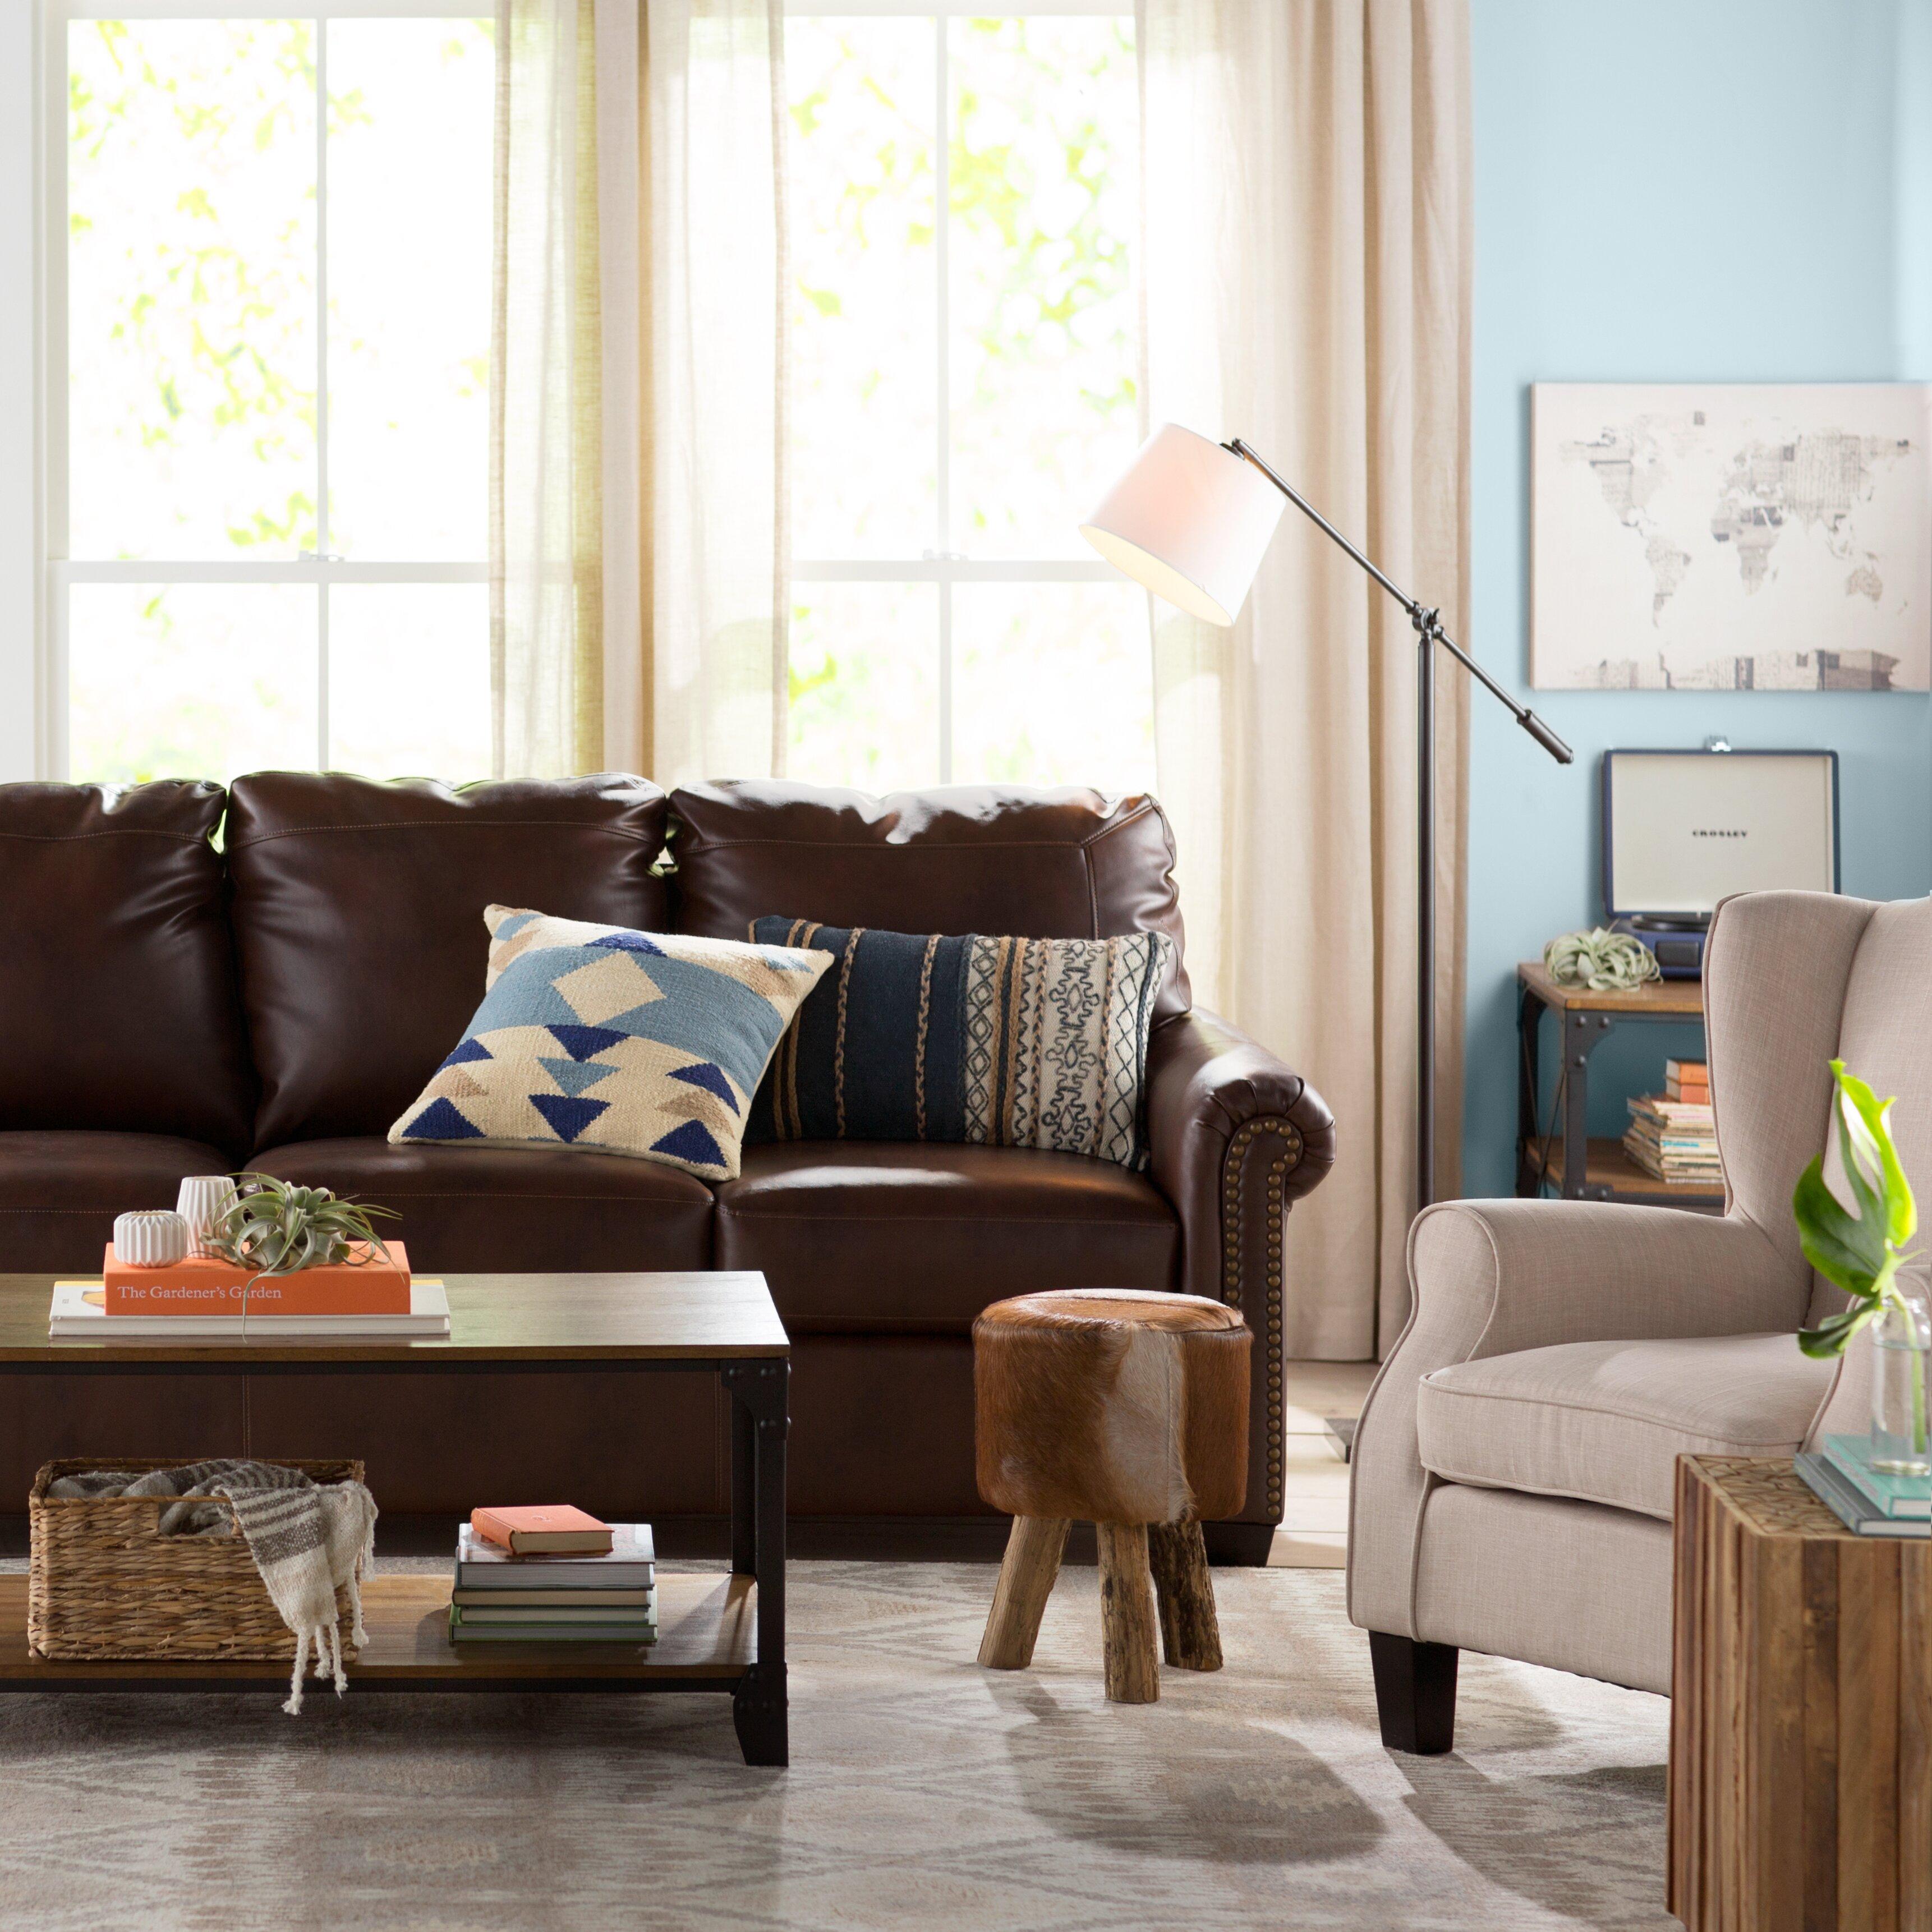 Three Piece Living Room Table Set Wholesale Interiors Baxton Studio 3 Piece Coffee Table Set